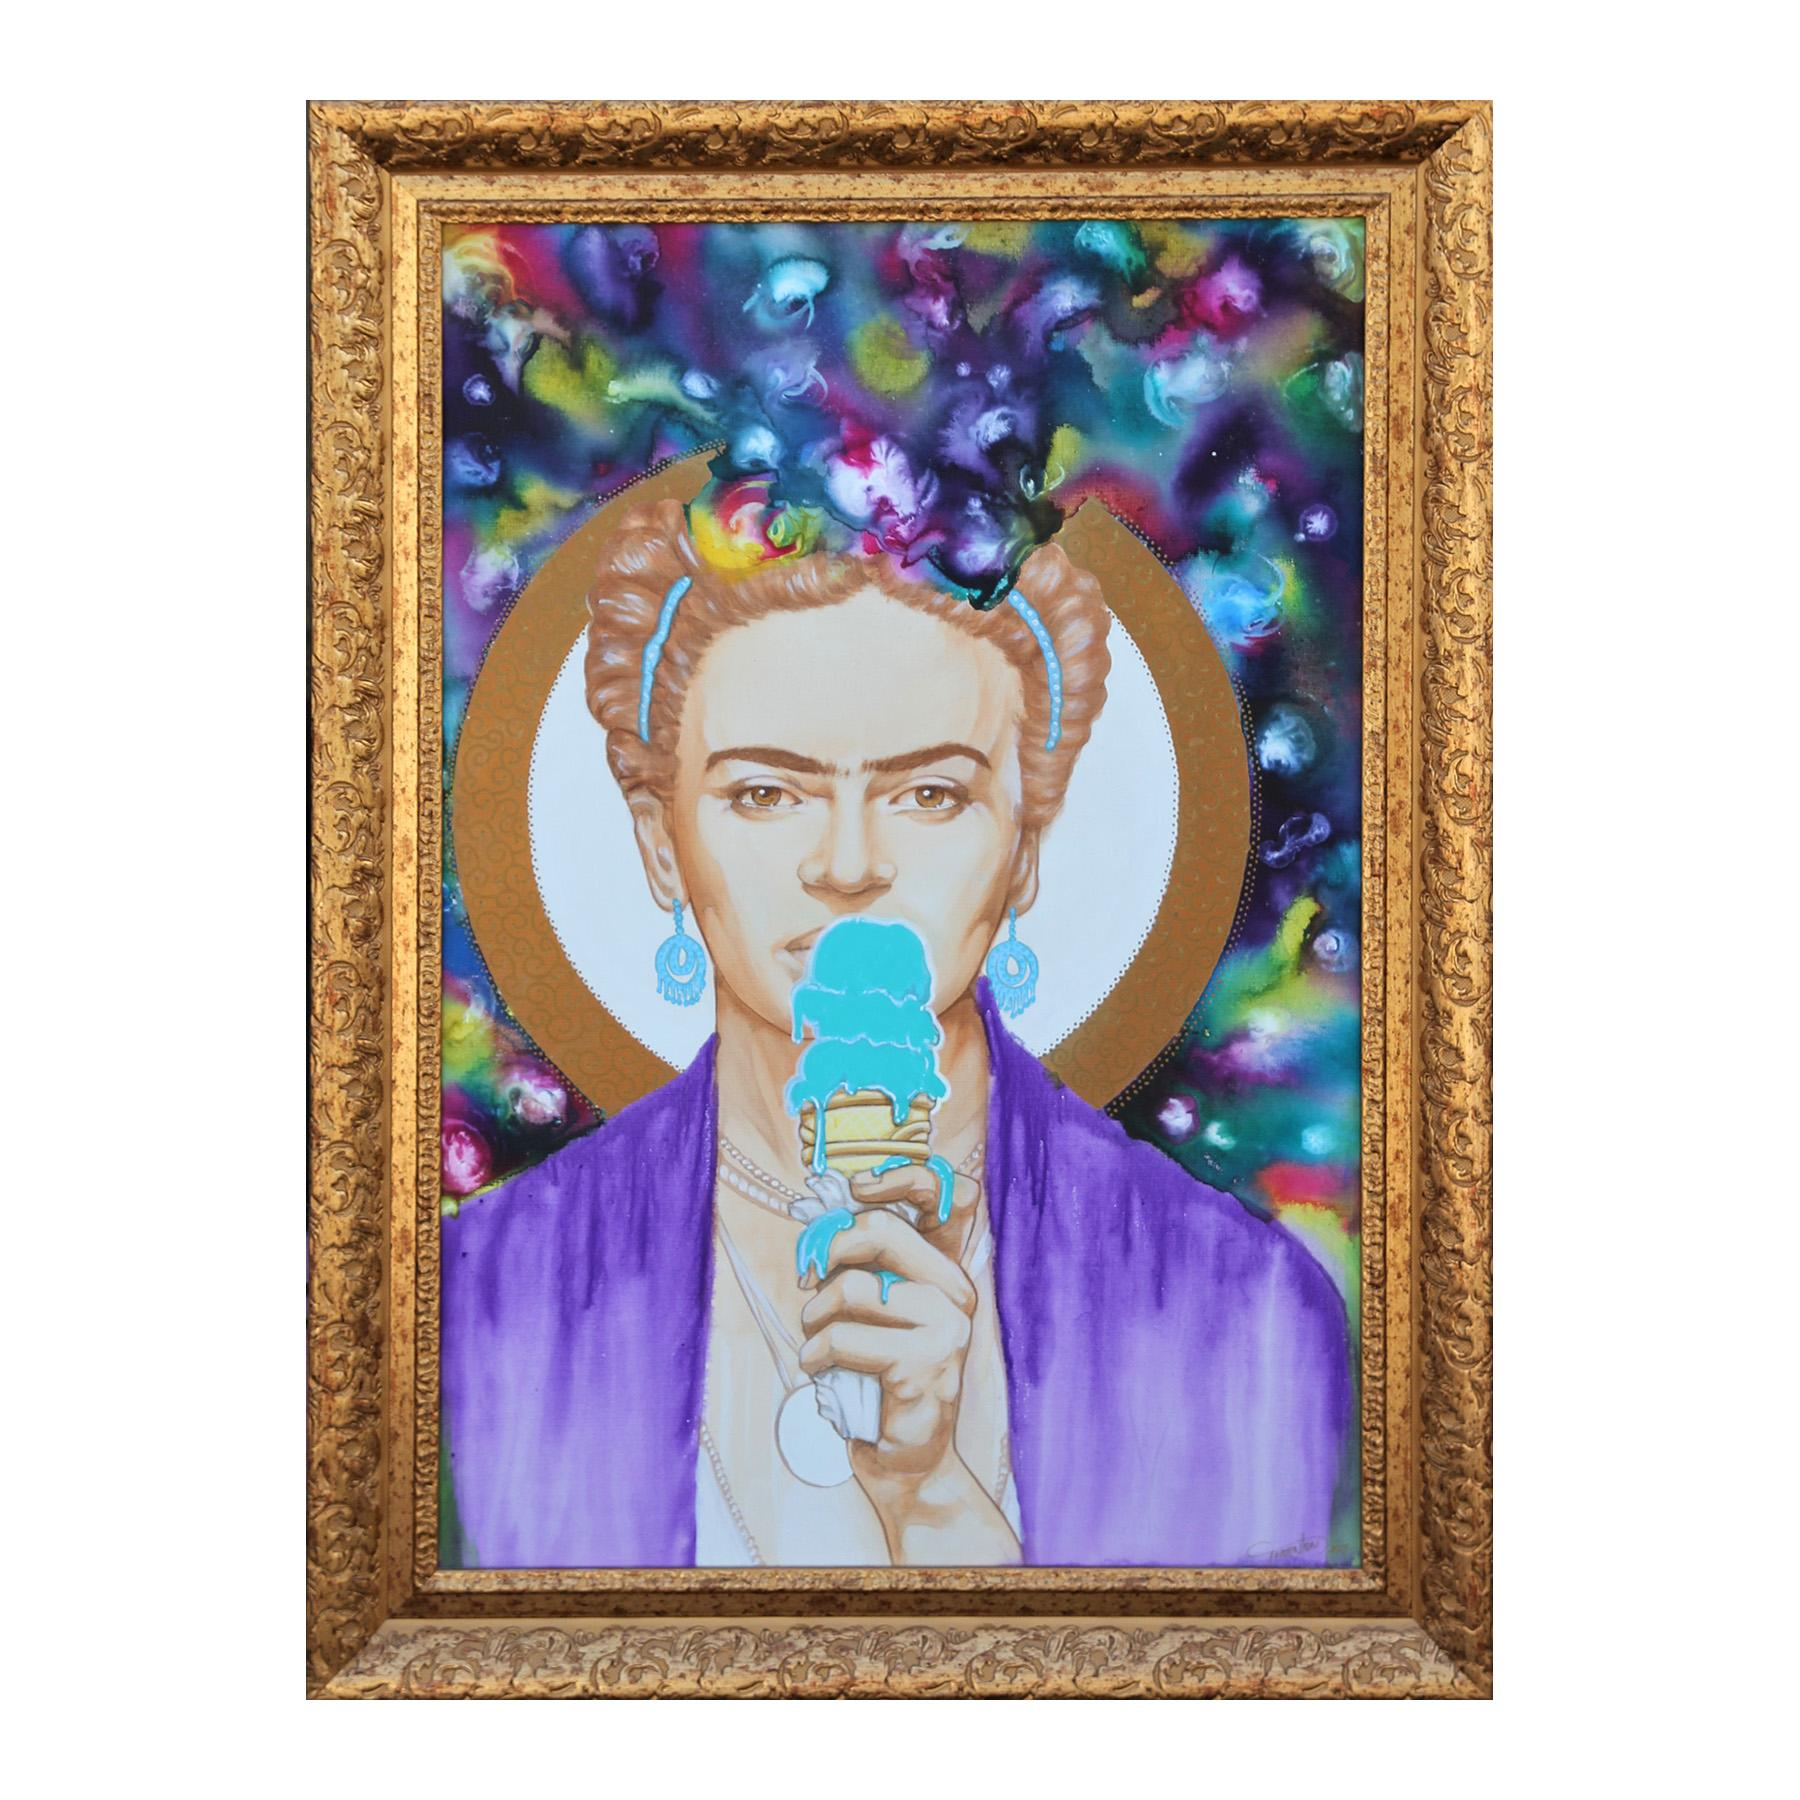 Contemporary Abstract Jewel Tone Frida Kahlo Ice Cream Portrait Signed Thornton